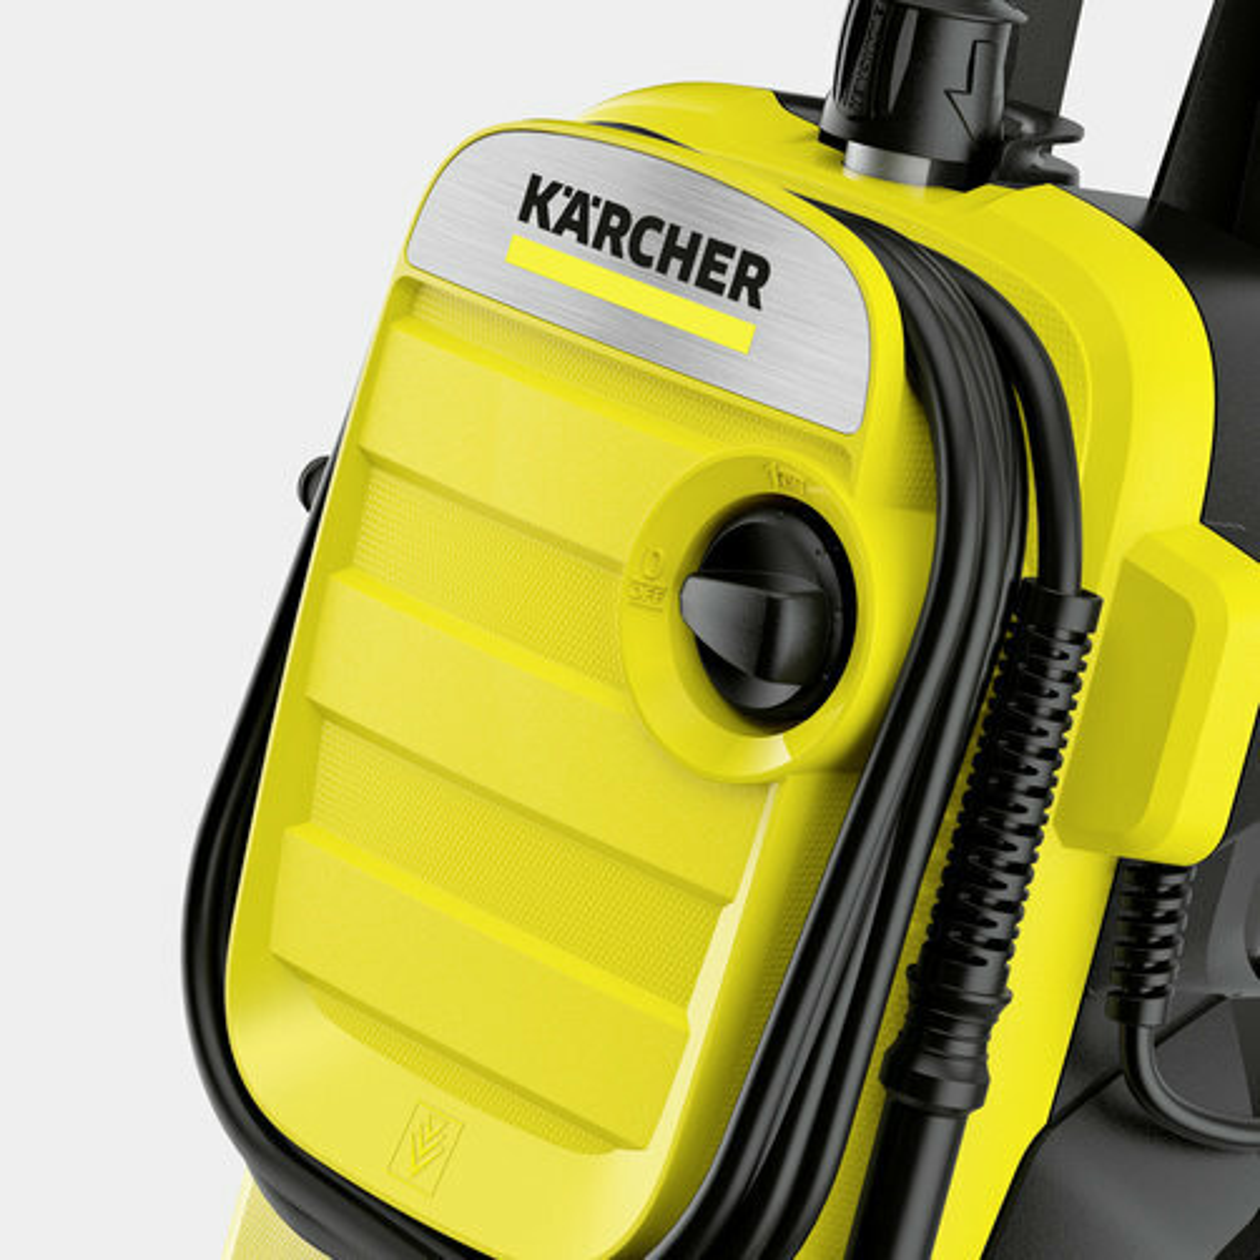 мойка высокого давления K 4 Compact: Хранение шланга на передней панели